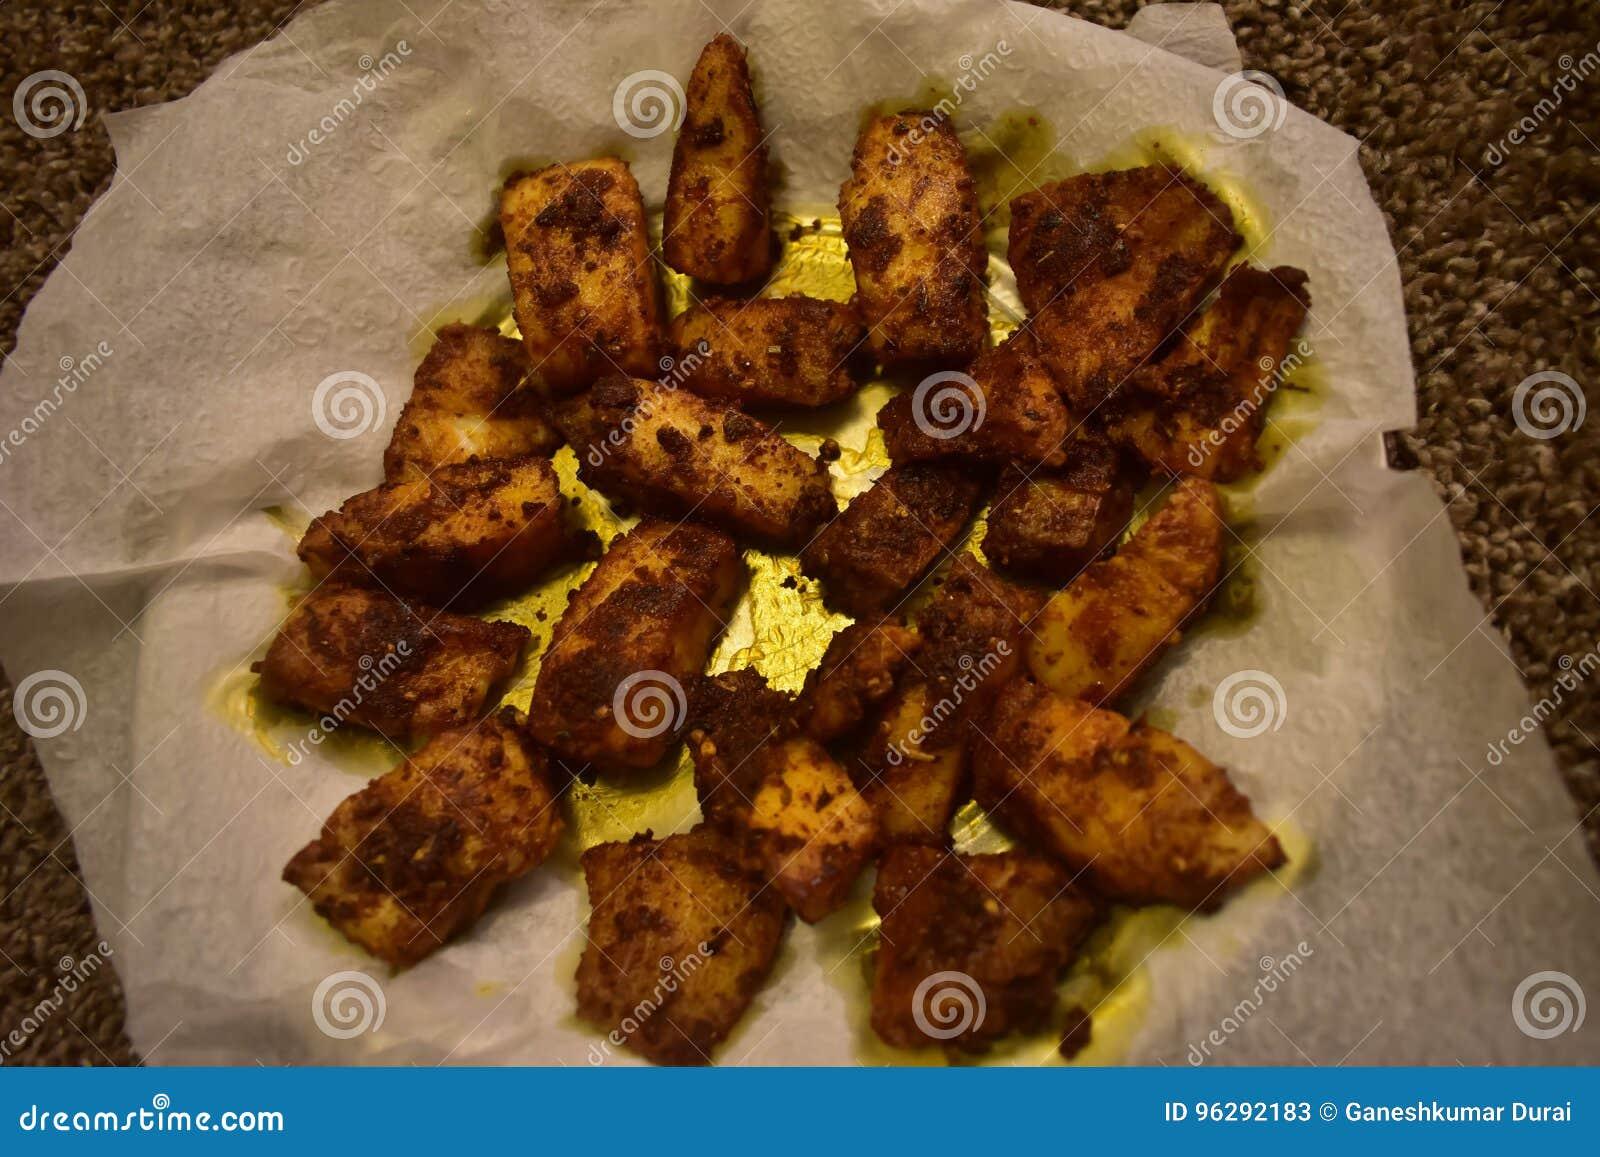 Tilapia Fish Recipe Stock Image Image Of Indian Style 96292183